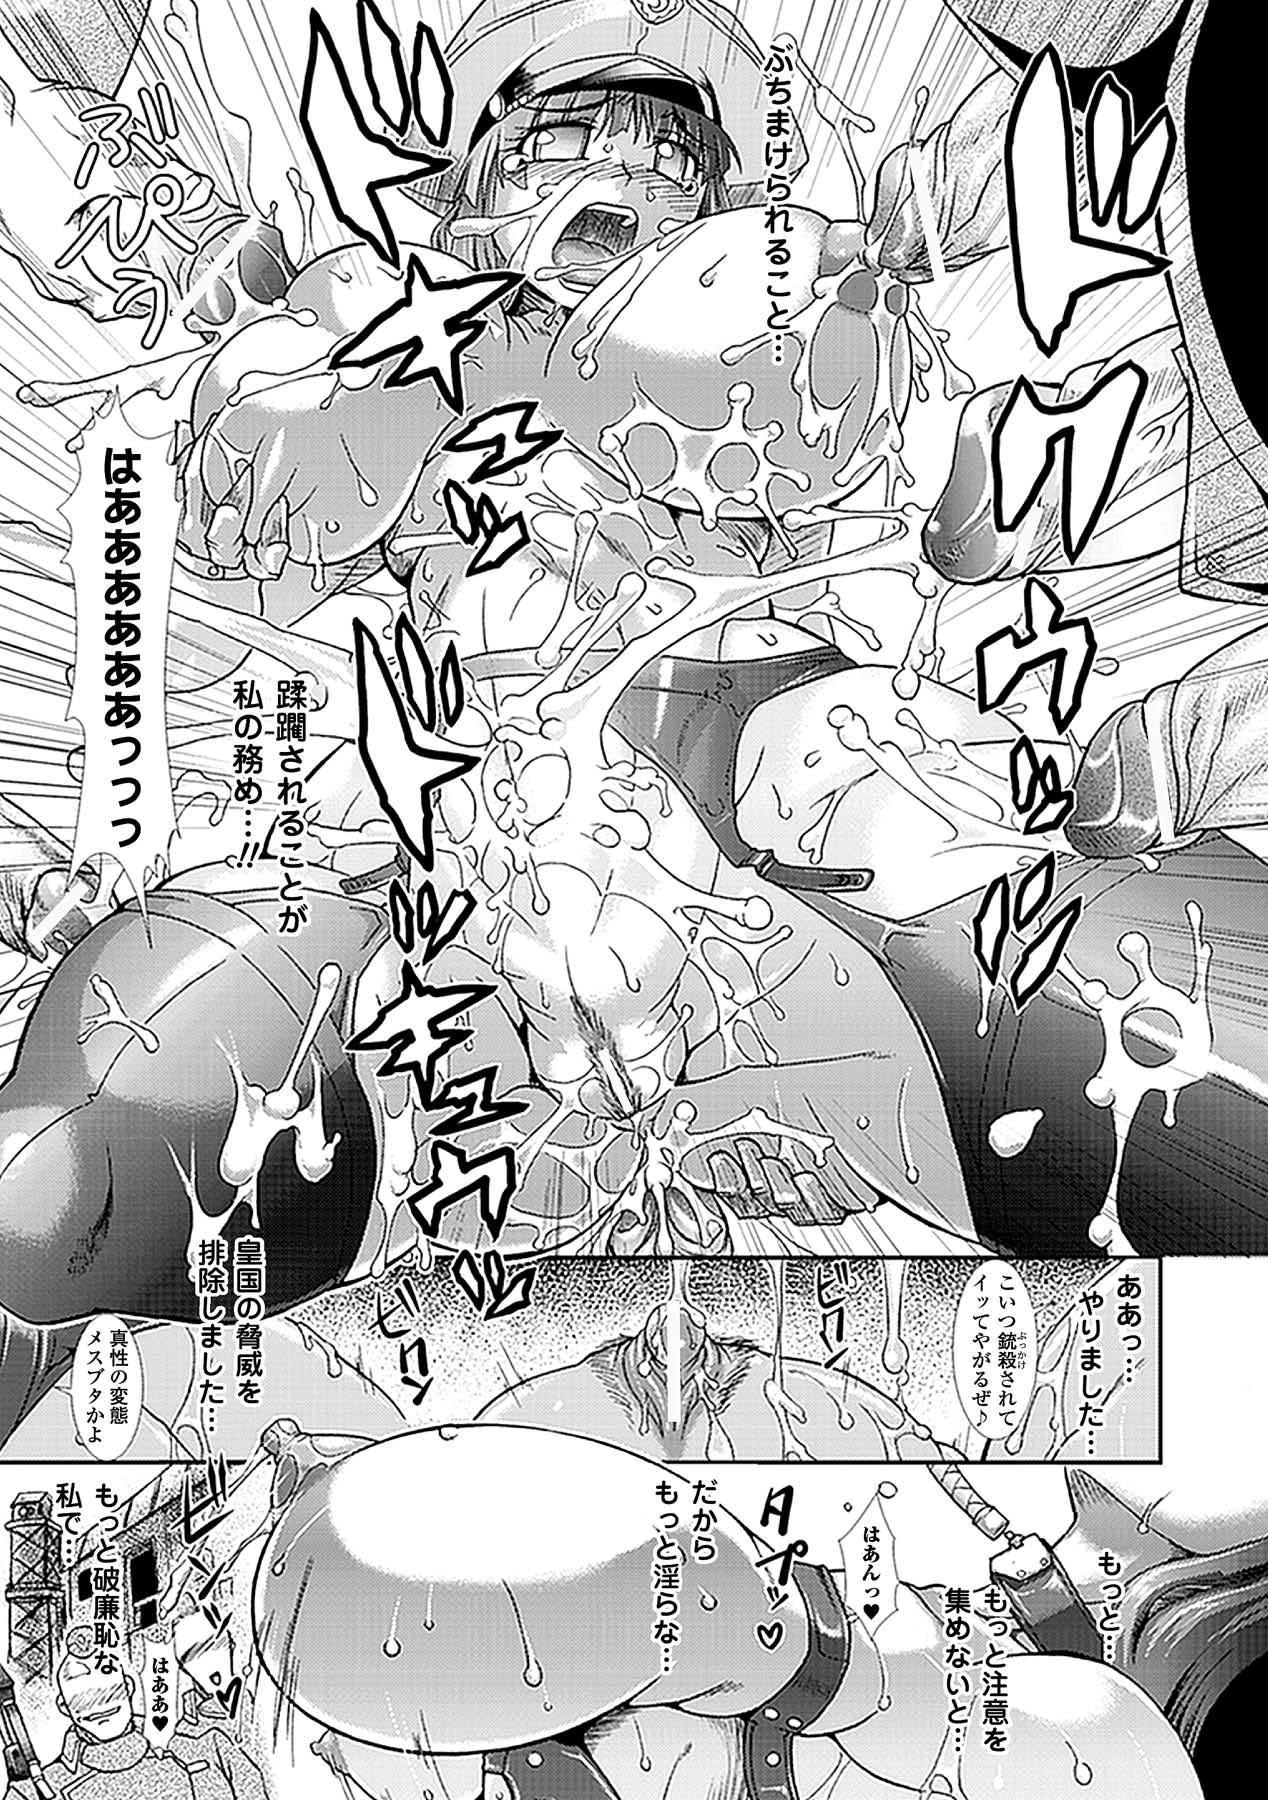 Kyousei Roshutsu Vol.1 Digital 58